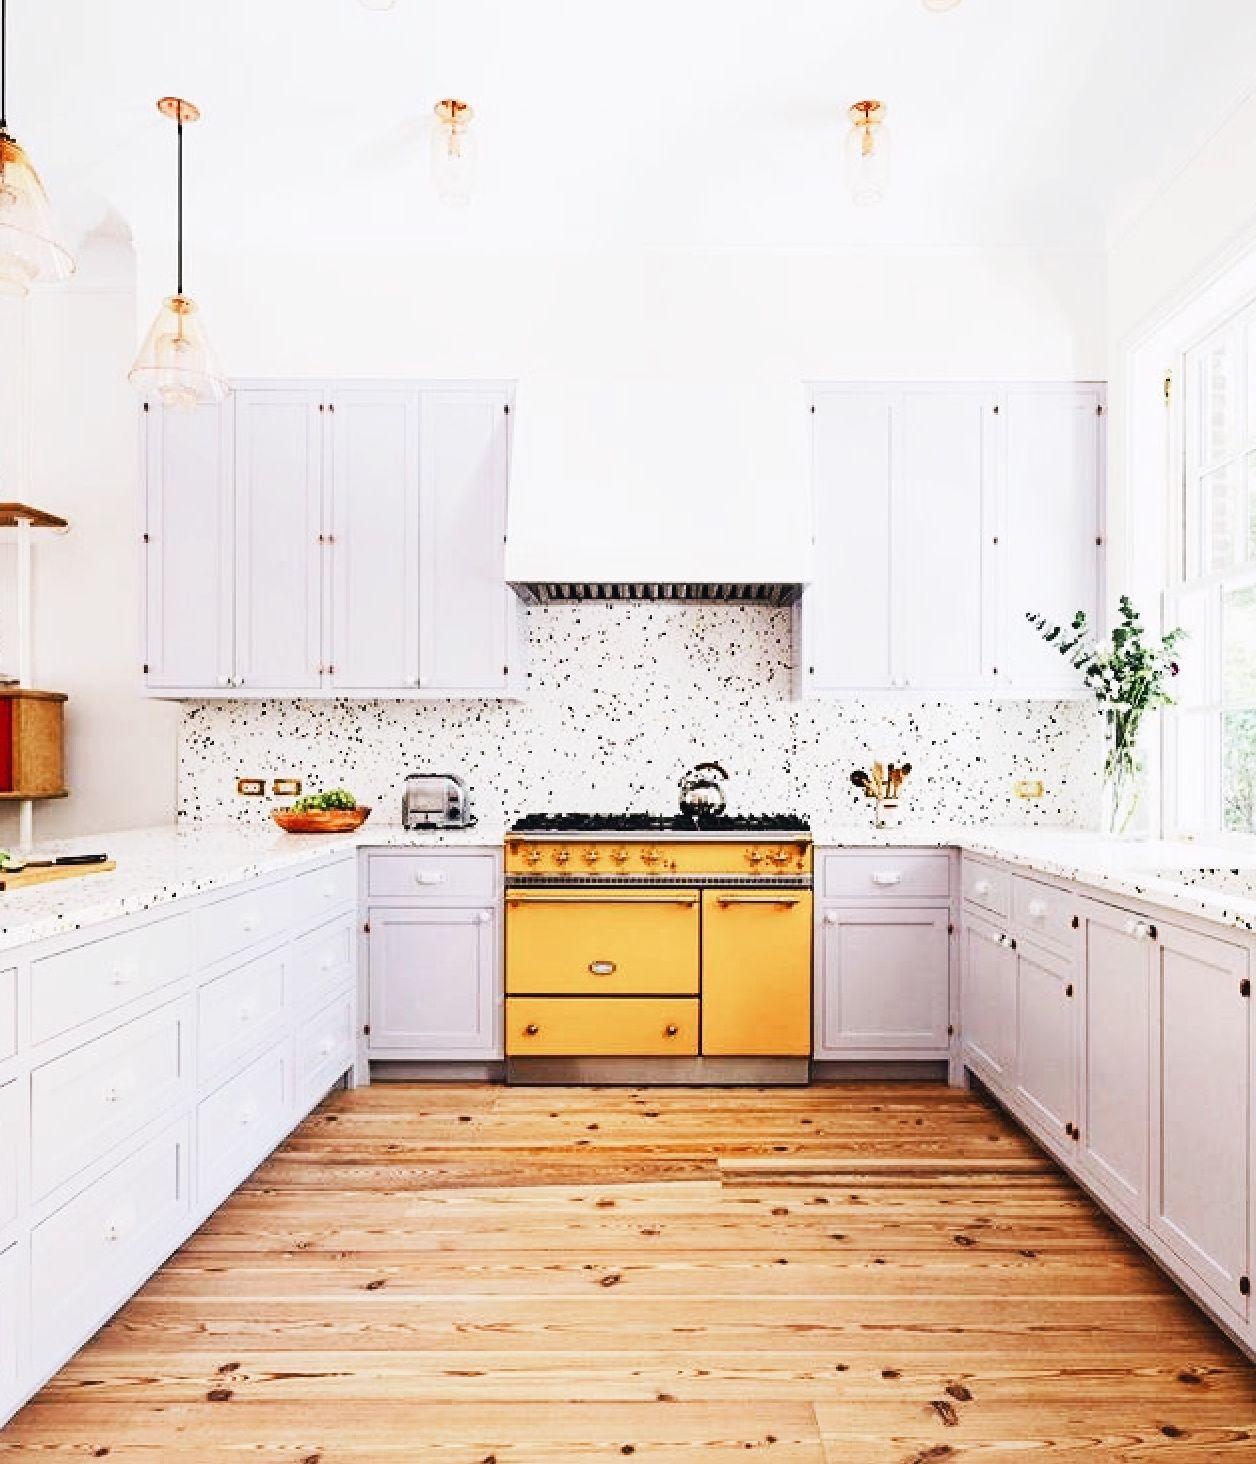 Mustard Yellow Kitchen Decor: Pin By Hannah Mac Kenzie On BBG